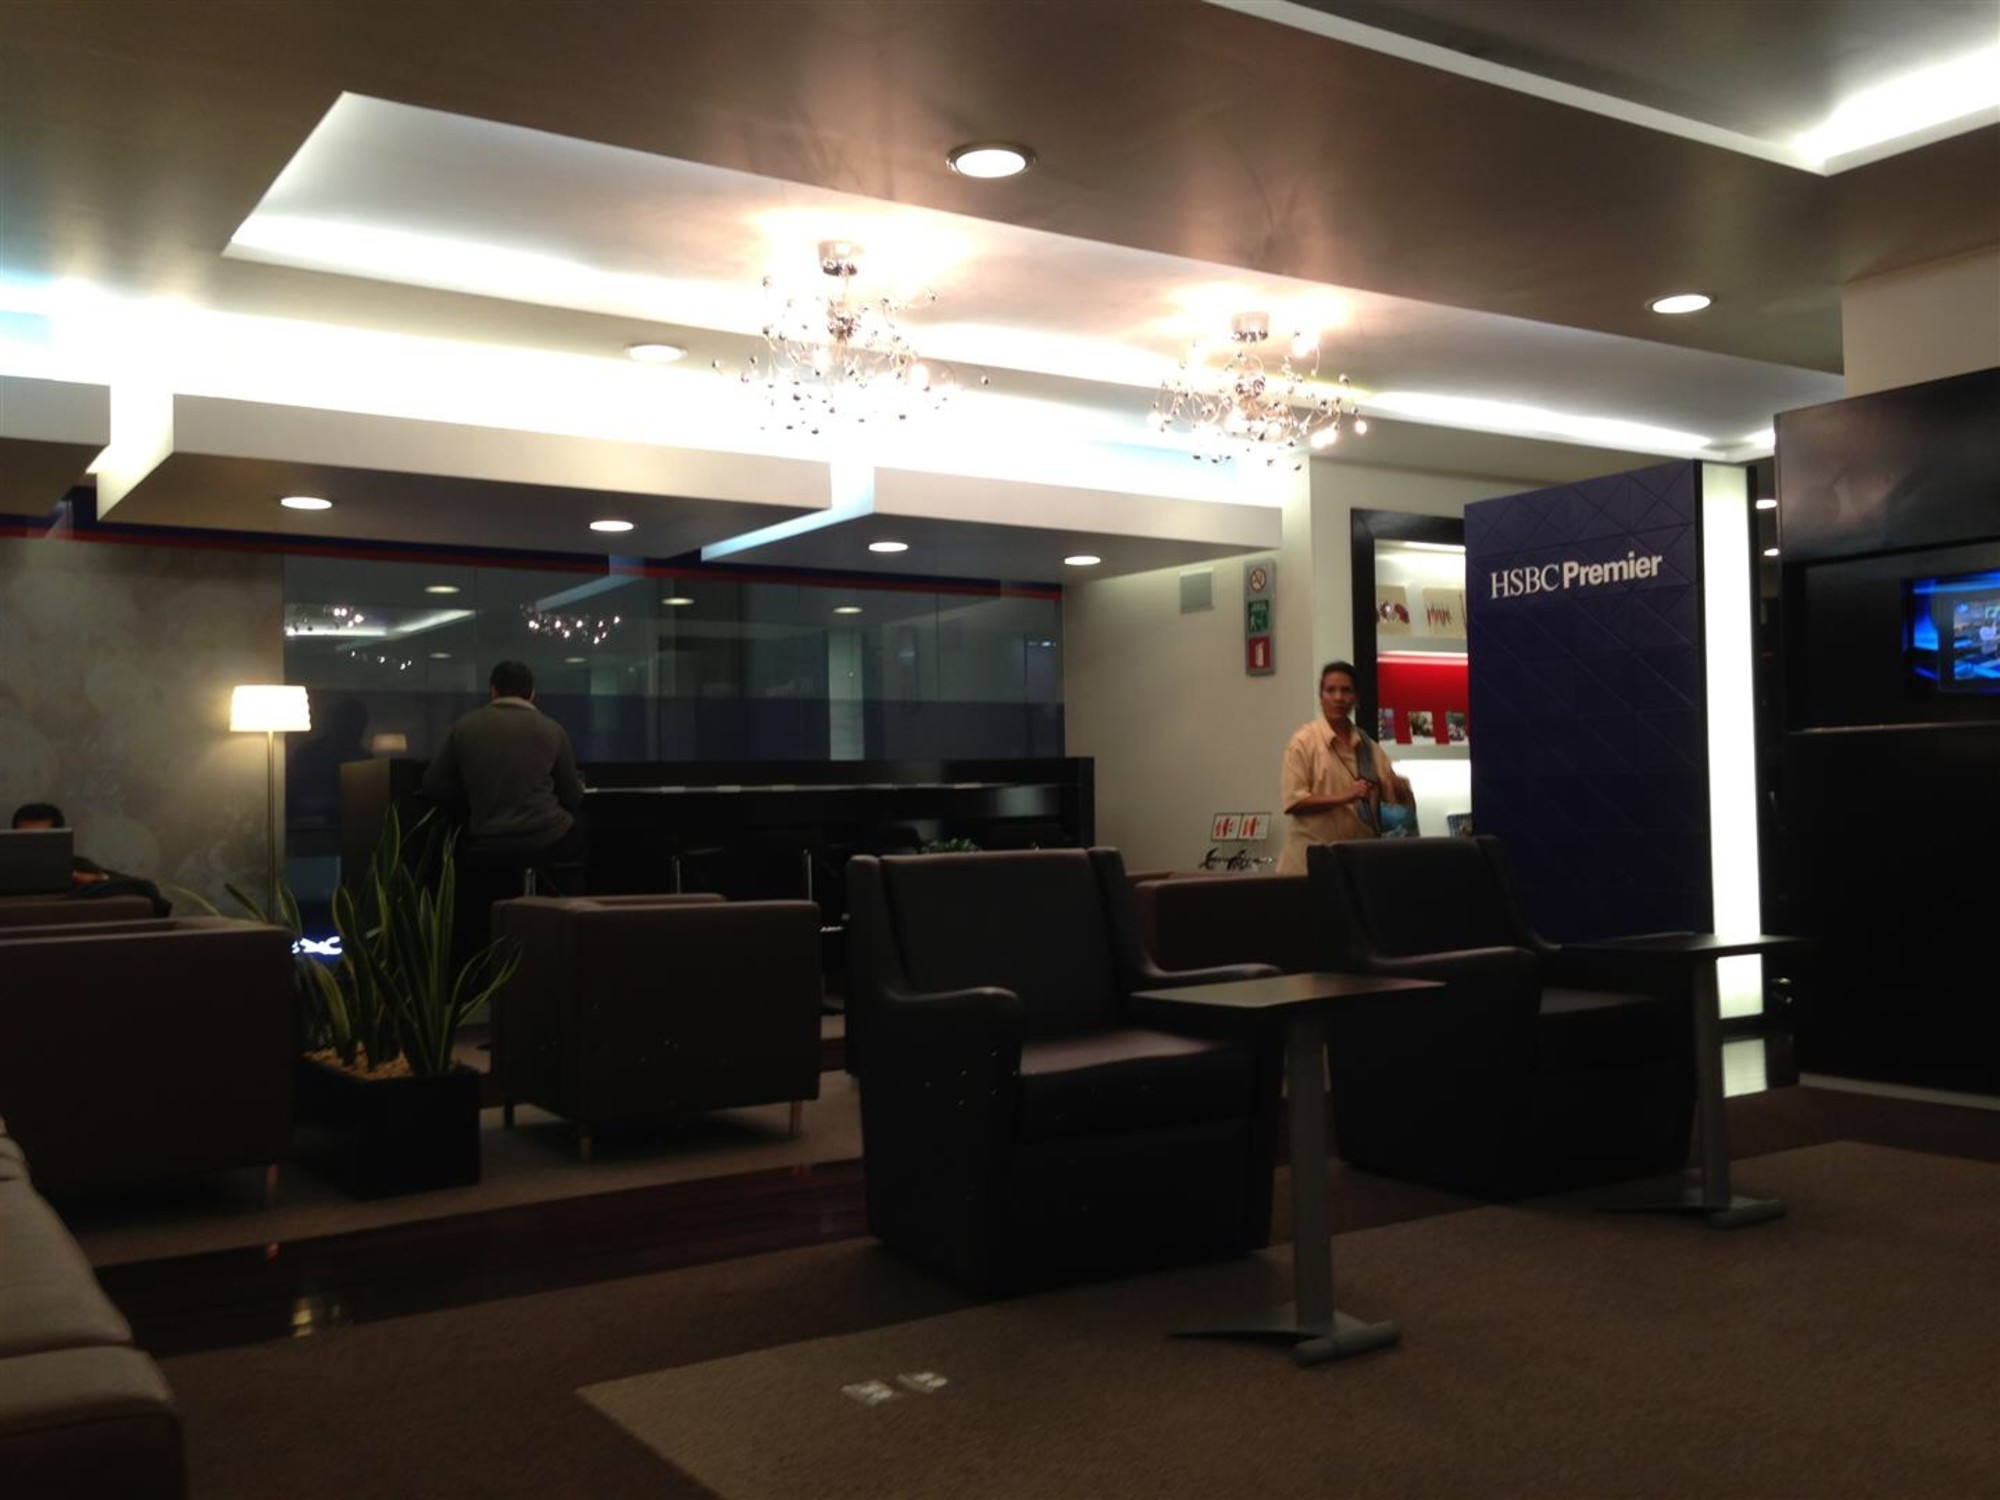 Mex Hsbc Premier Lounge Reviews Photos Terminal 2 Mexico